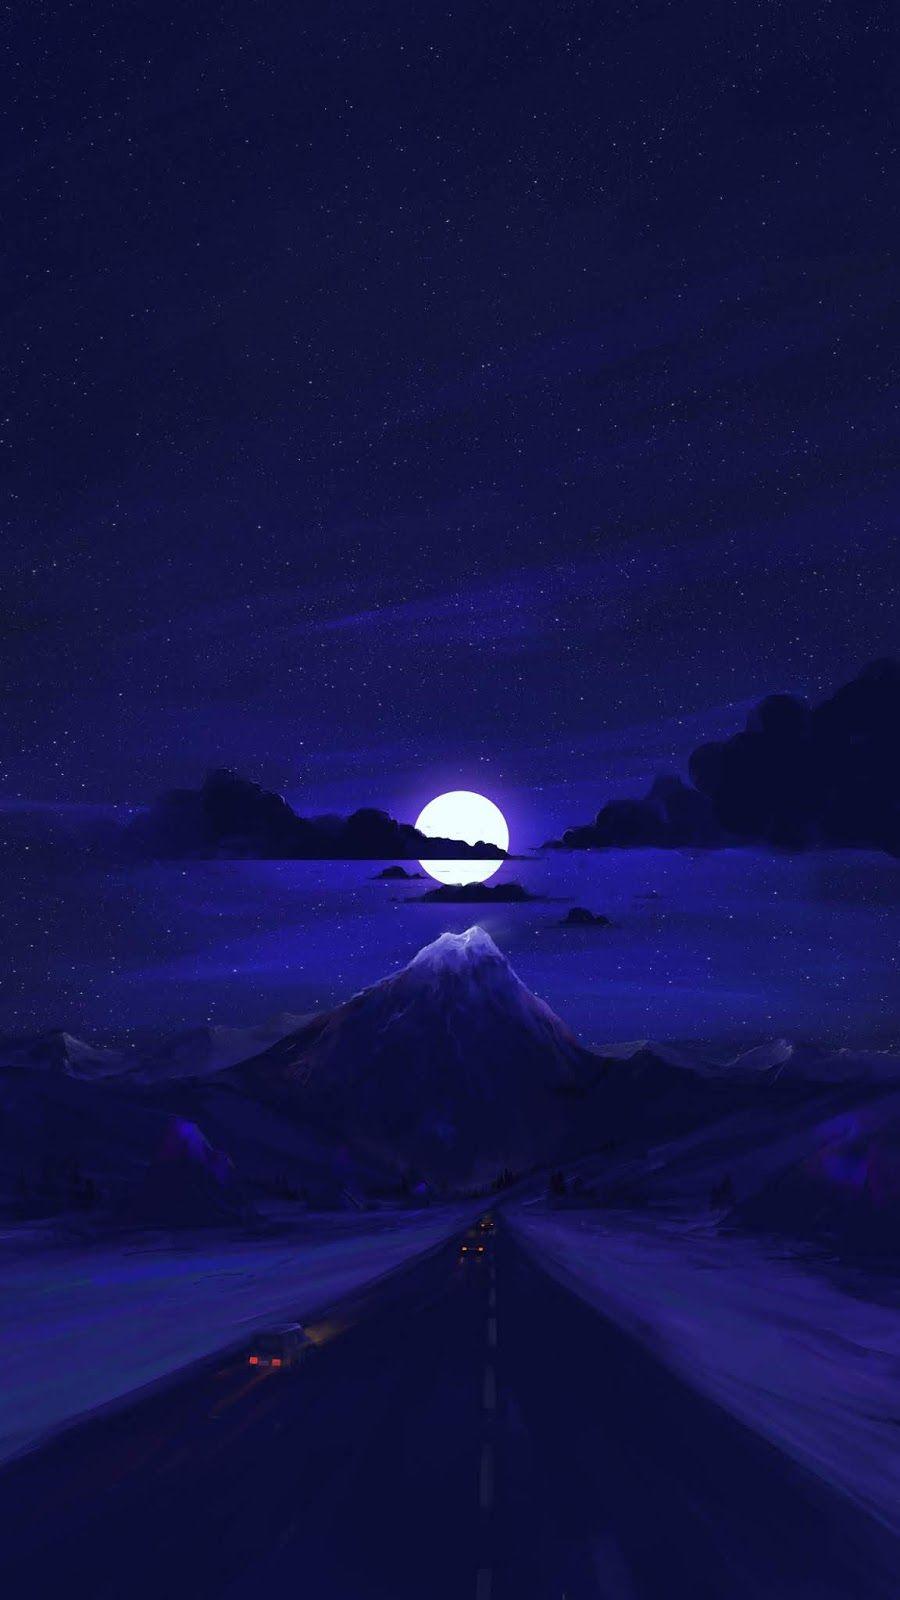 Moonlight Iphone Wallpaper Beautiful Wallpapers Cool Backgrounds